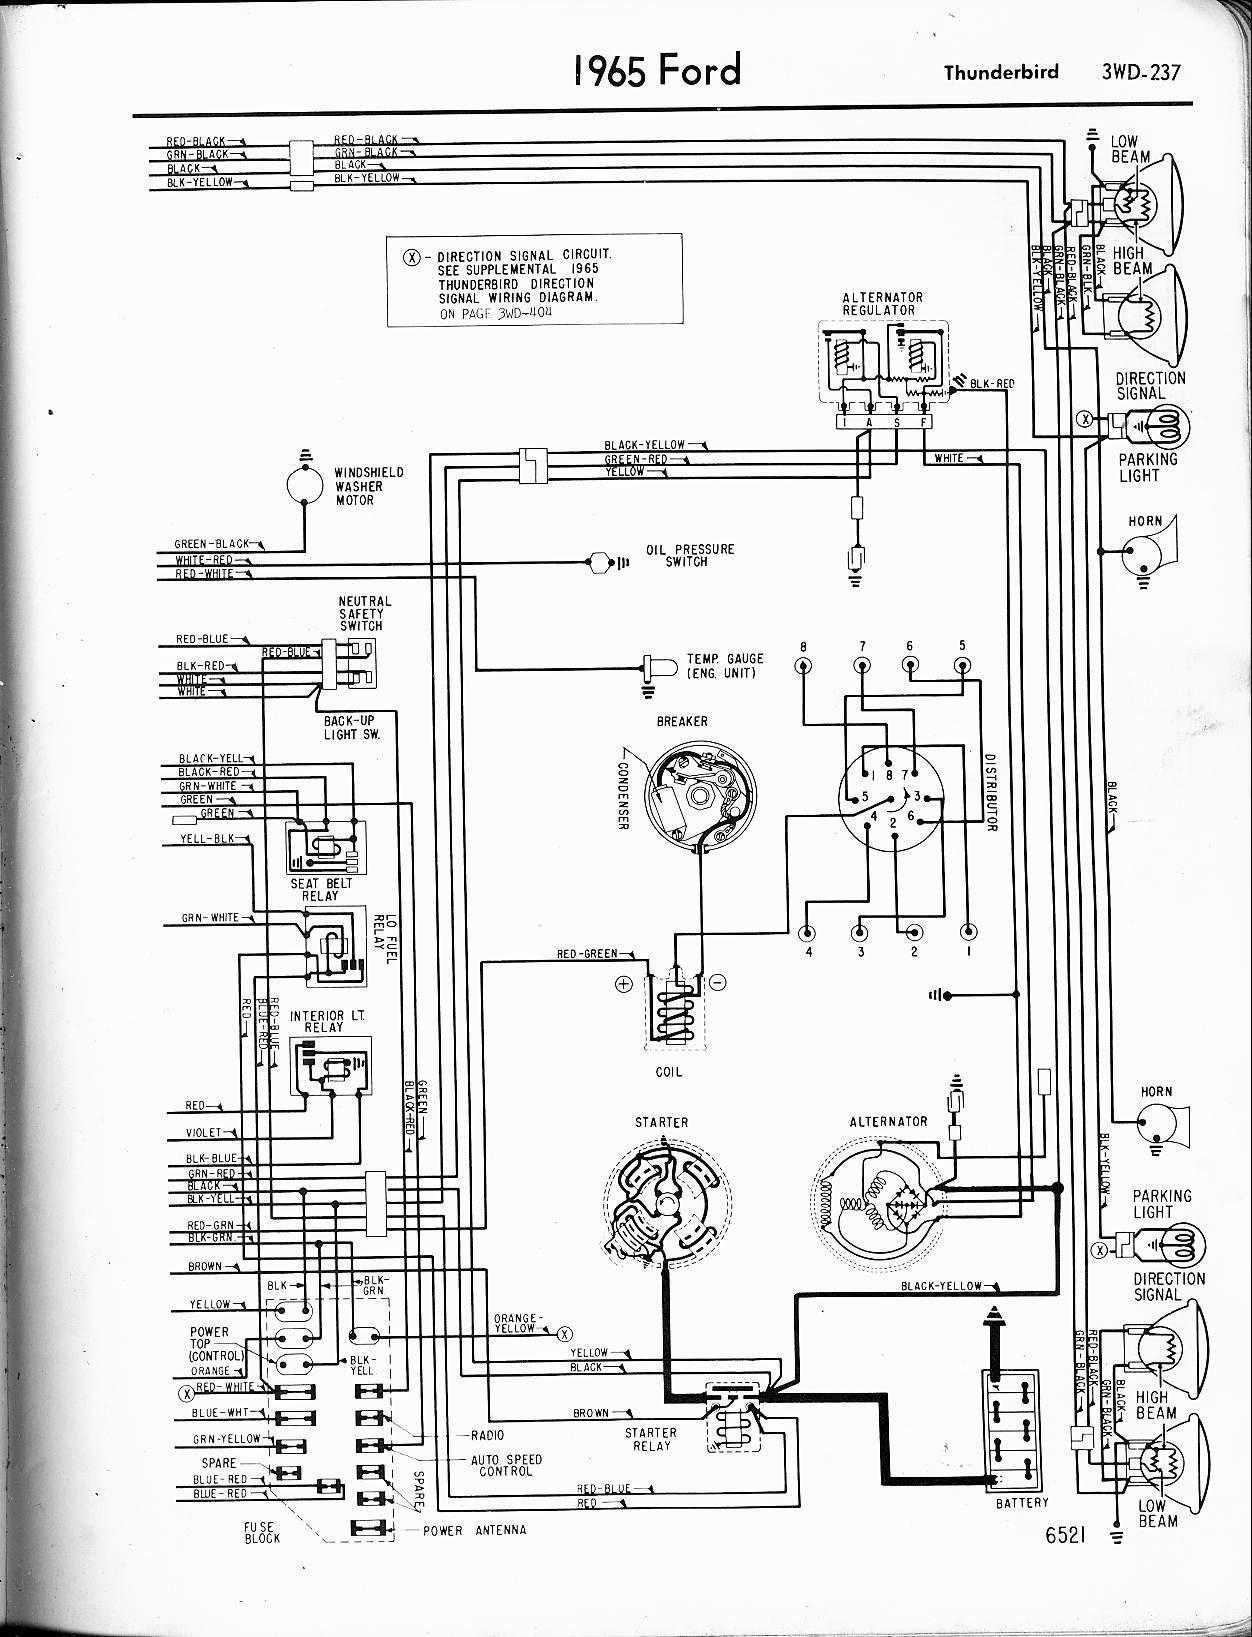 mercruiser 260 alternator wiring diagram five way switch to battery new